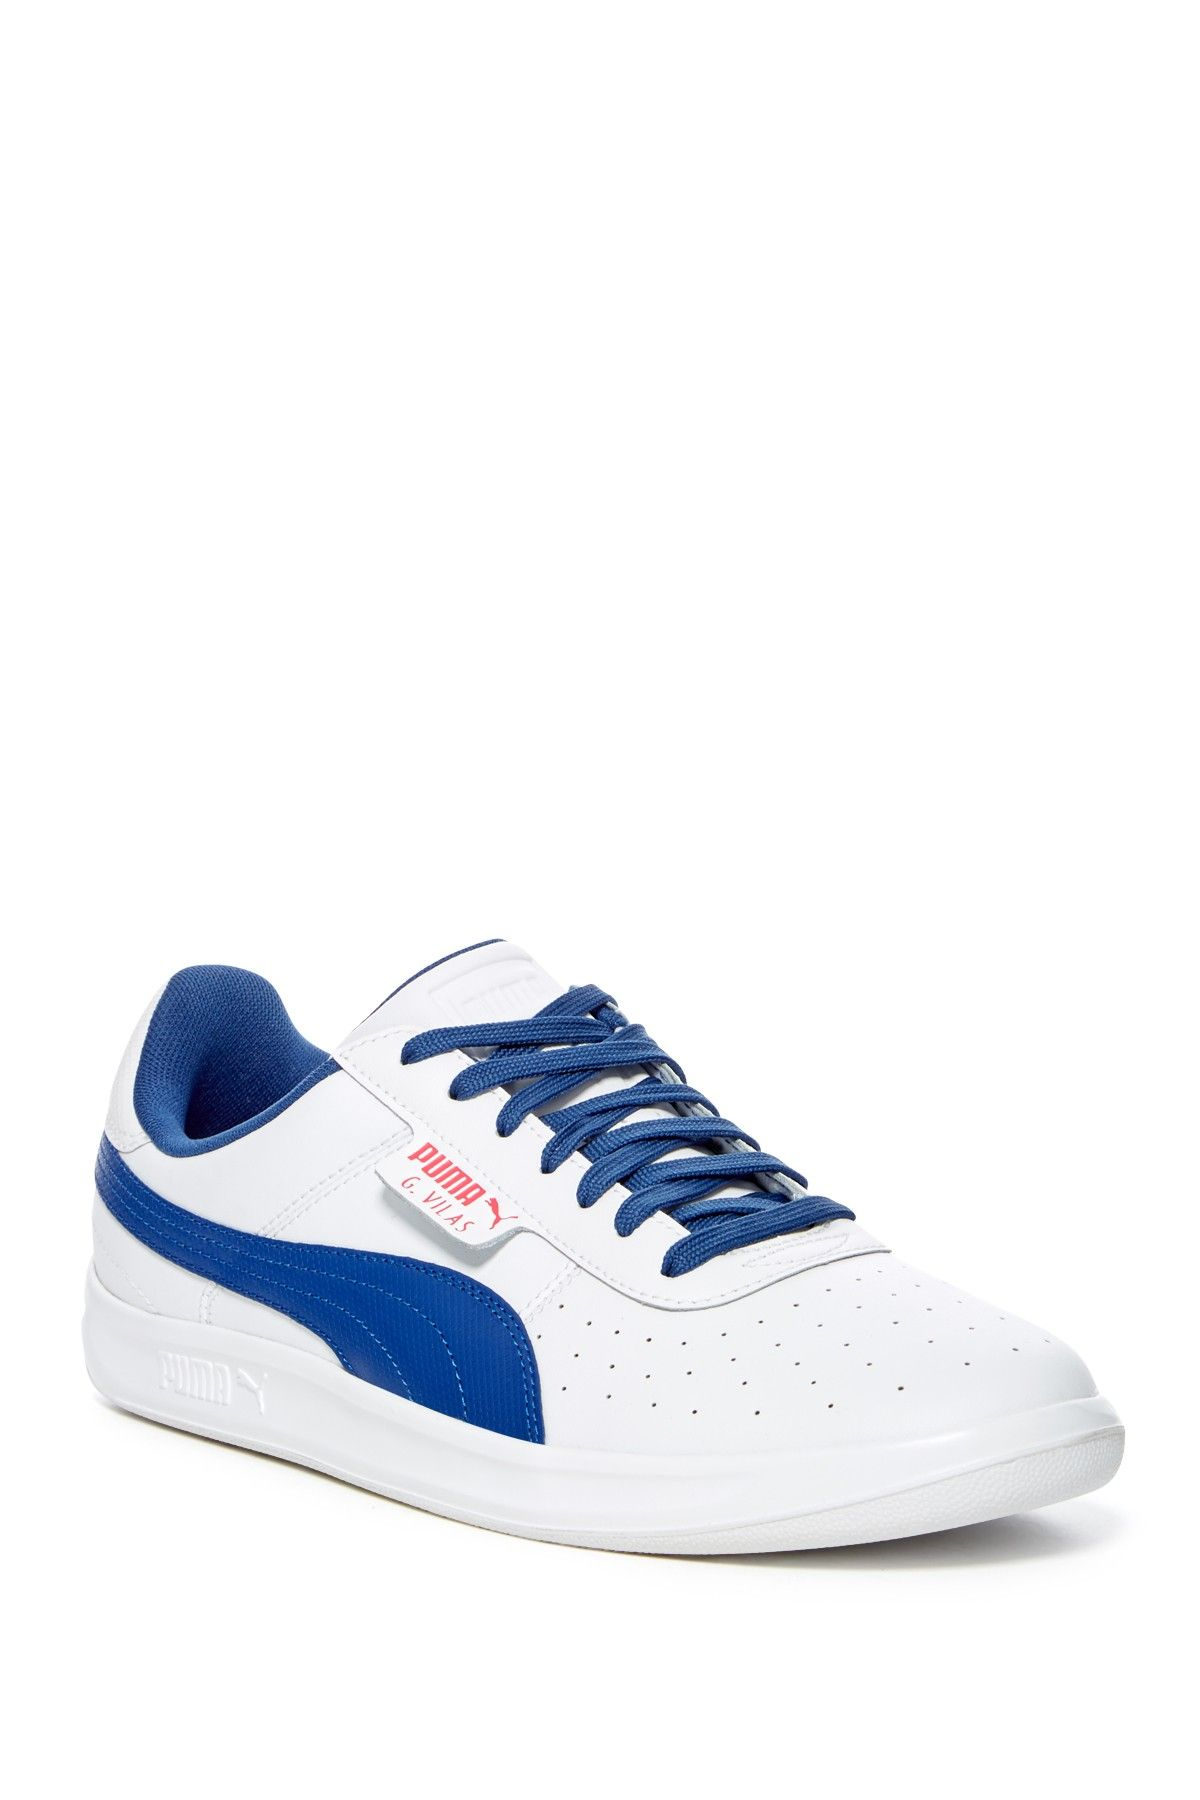 G Villas 2 Sneaker Products